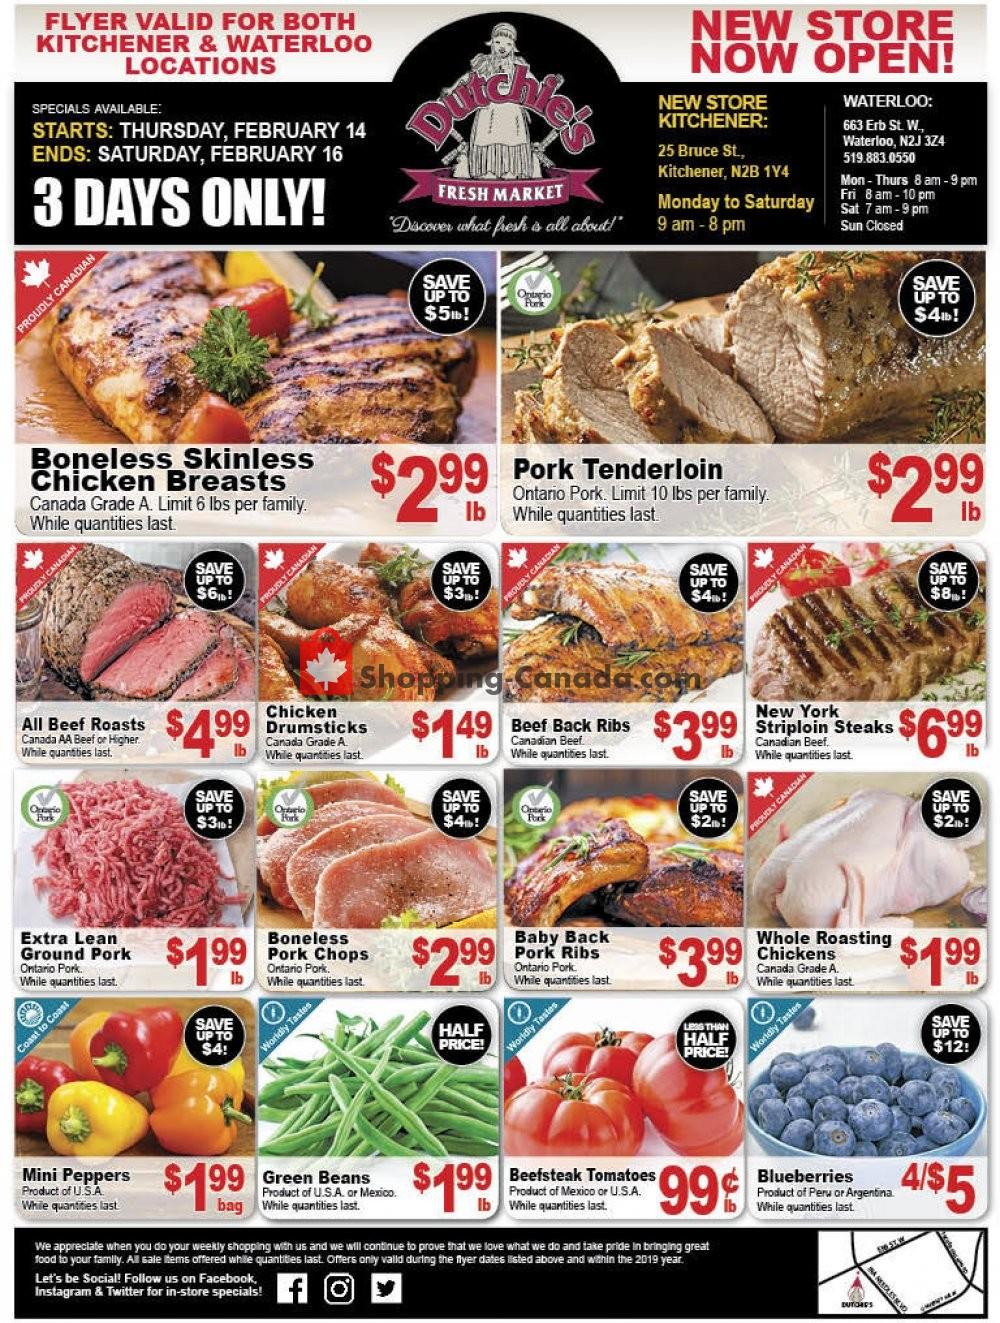 Flyer Dutchie's Fresh Market Canada - from Thursday February 14, 2019 to Saturday February 16, 2019